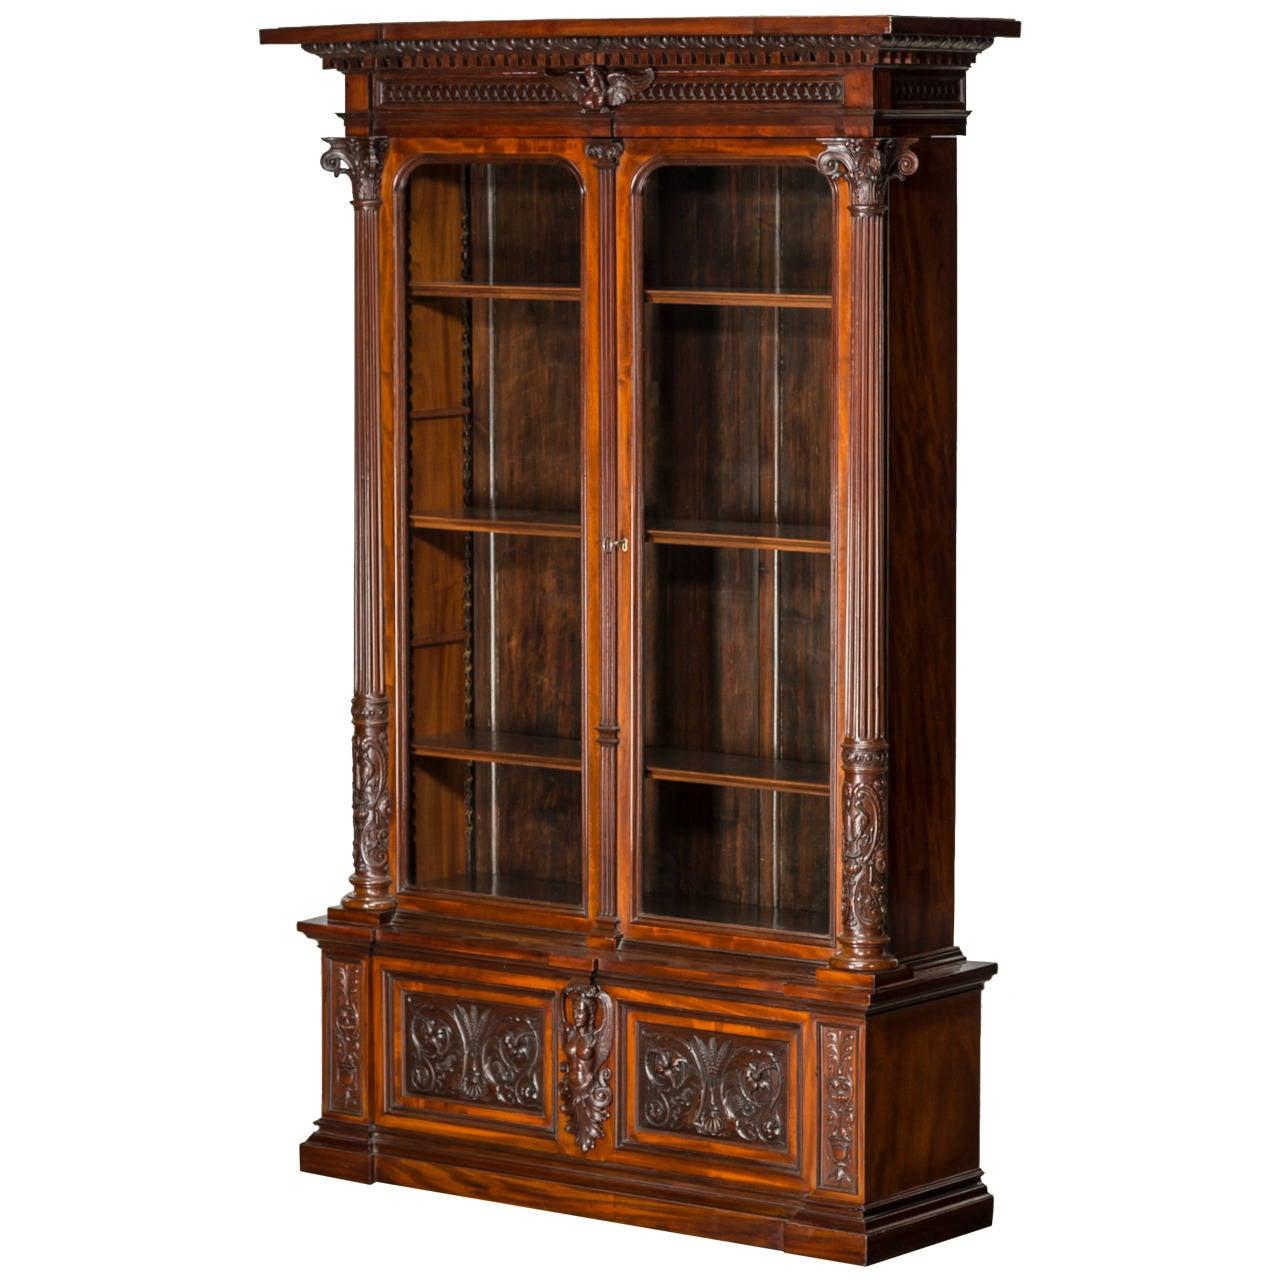 Impressive Display Cabinet, England, Mid-19th Century